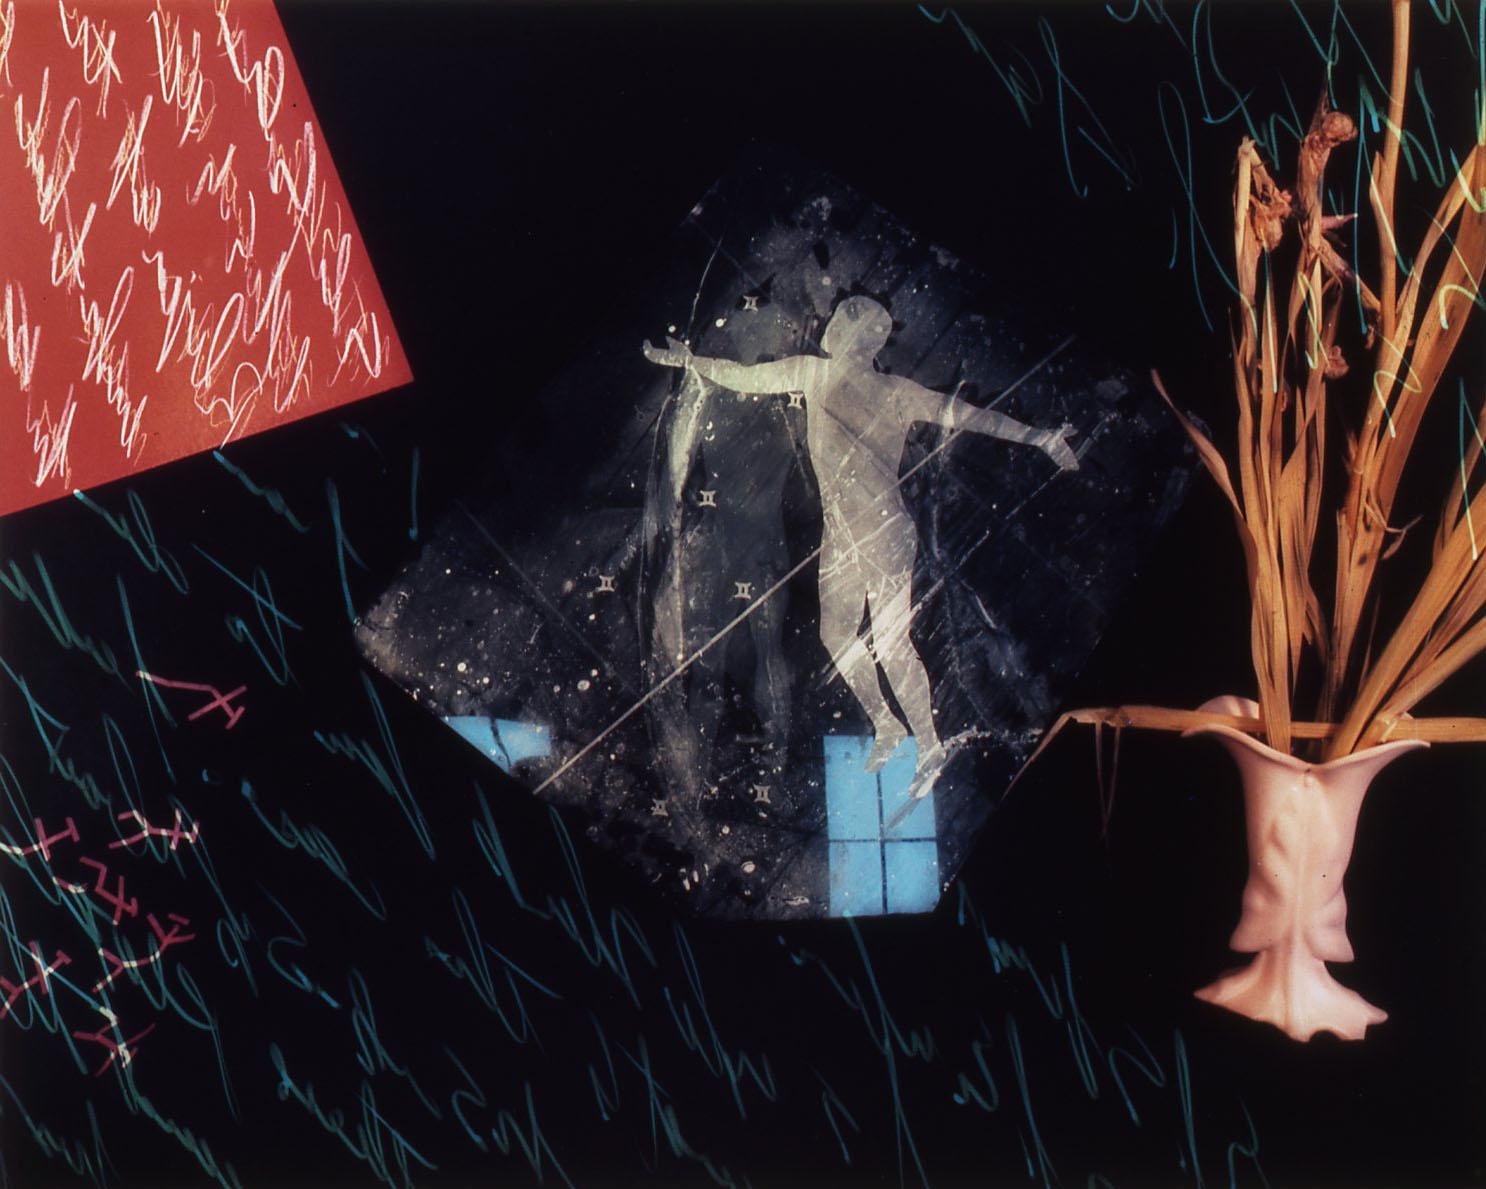 """Studio C Series/Dramatic Figure Emerging from Window"", 1985, 20x24"""